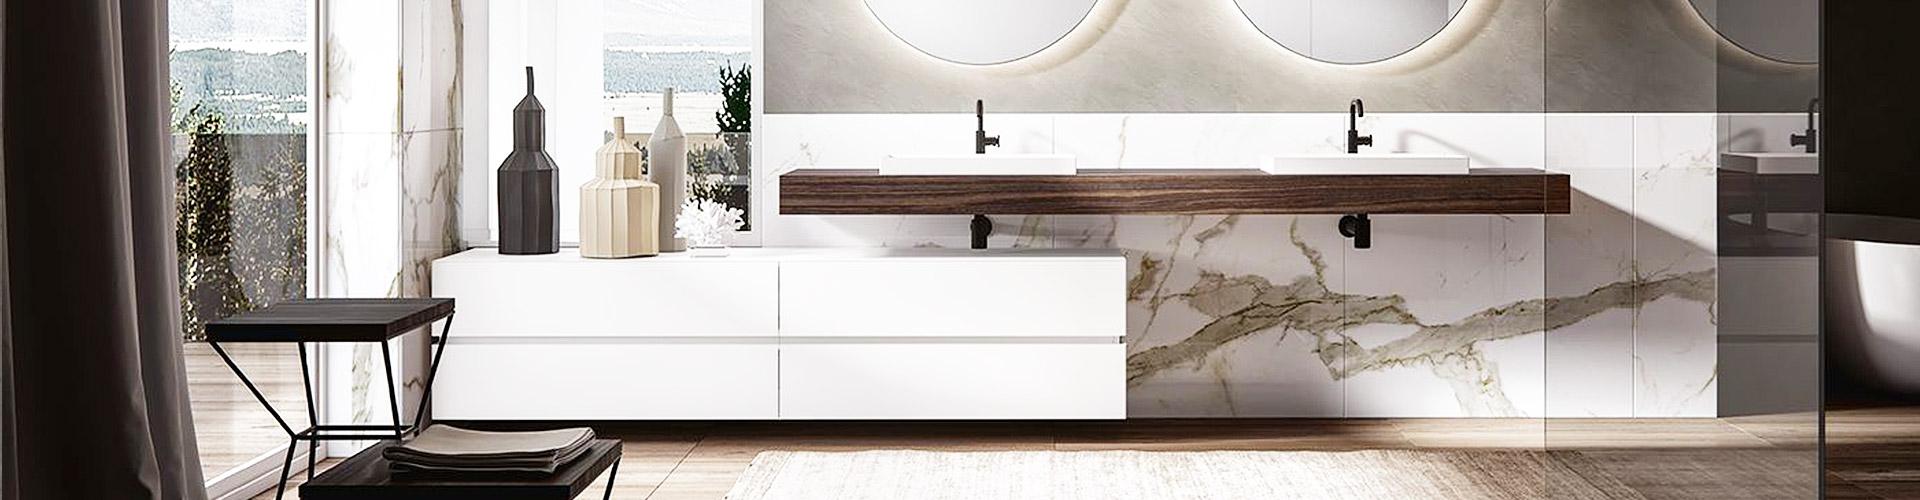 Mobili arredo bagno edon carboni casa - Agora mobili bagno ...